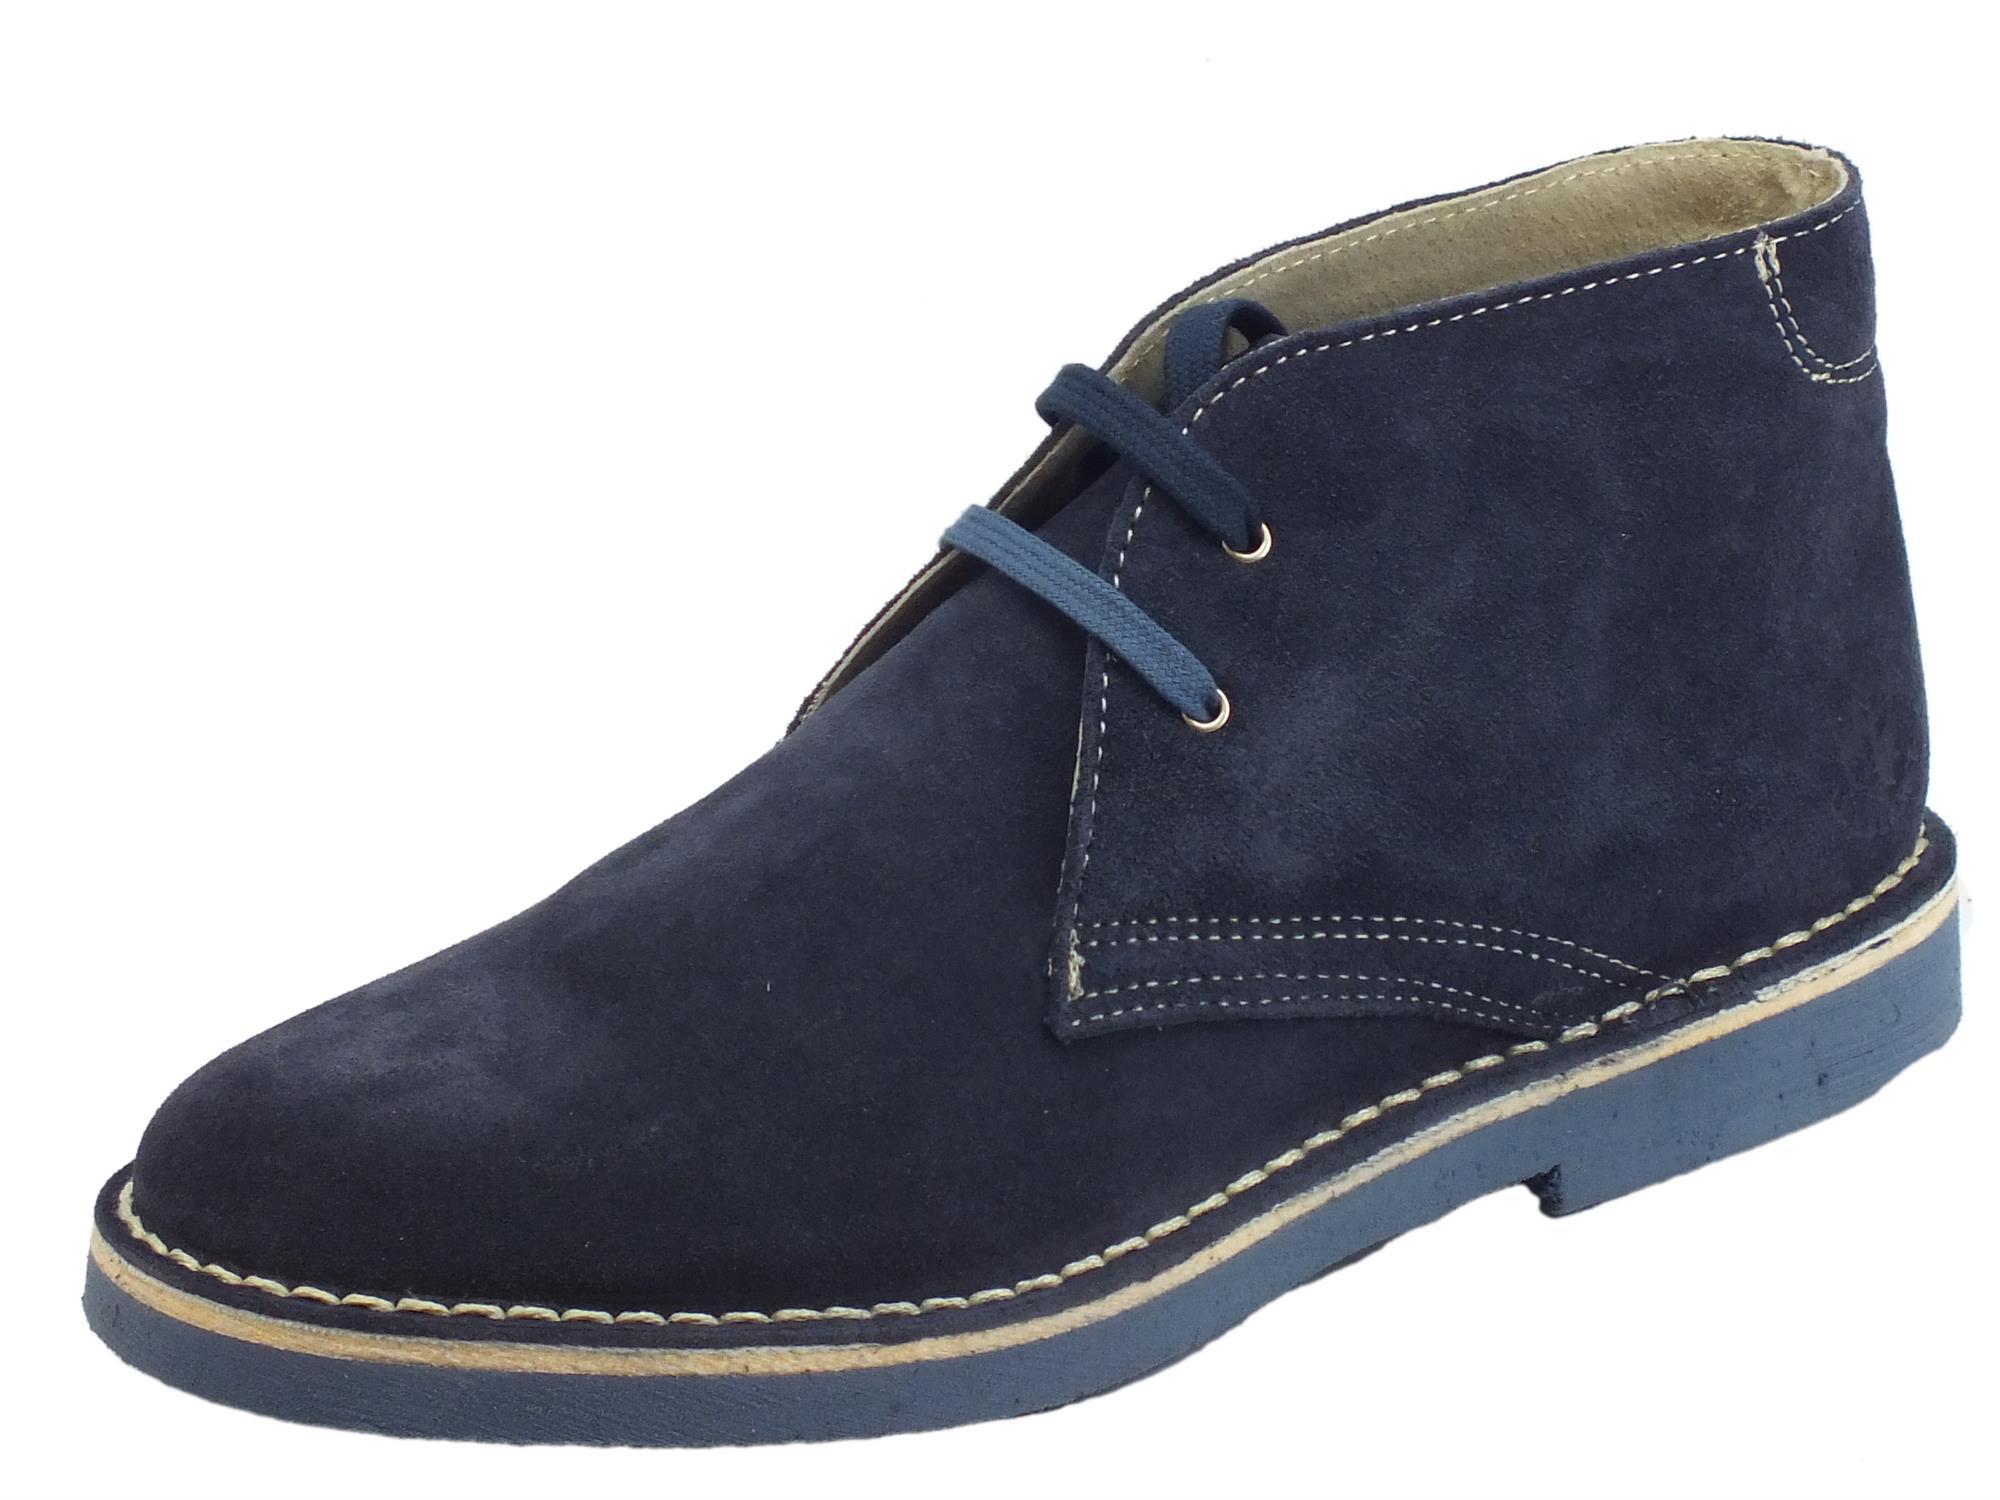 f18b5ccaa4 Lumberjack Gable scarpe polacchine uomo camoscio jeans ed - Vitiello ...